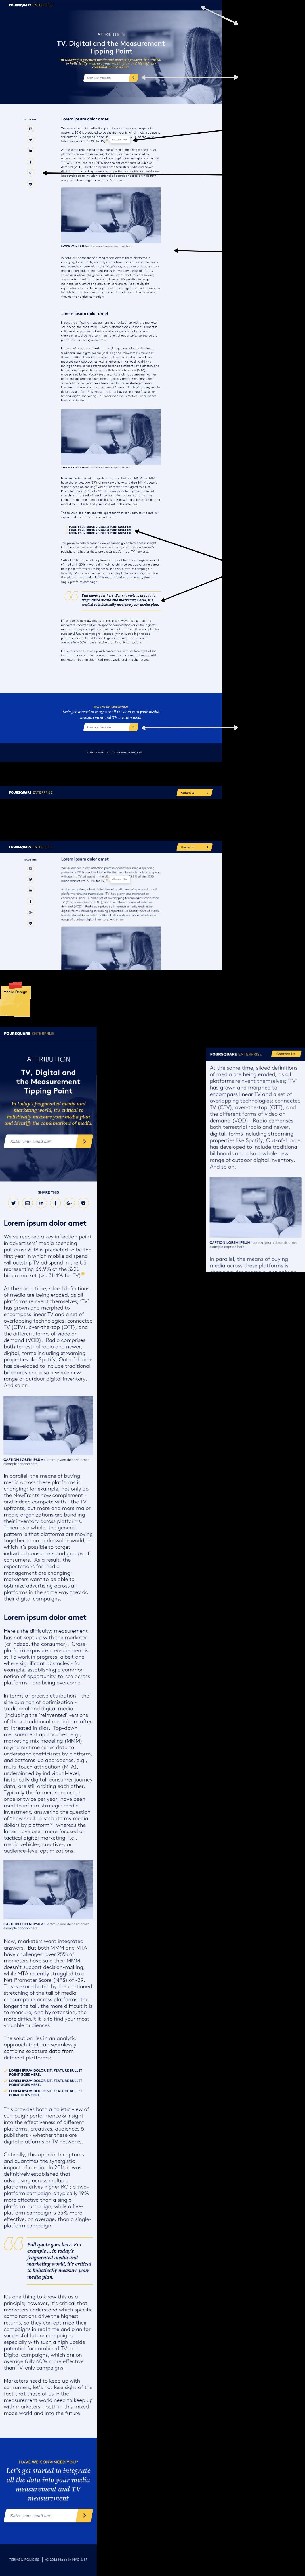 Editorial Template - Newsletter - Desktop + Mobile.png